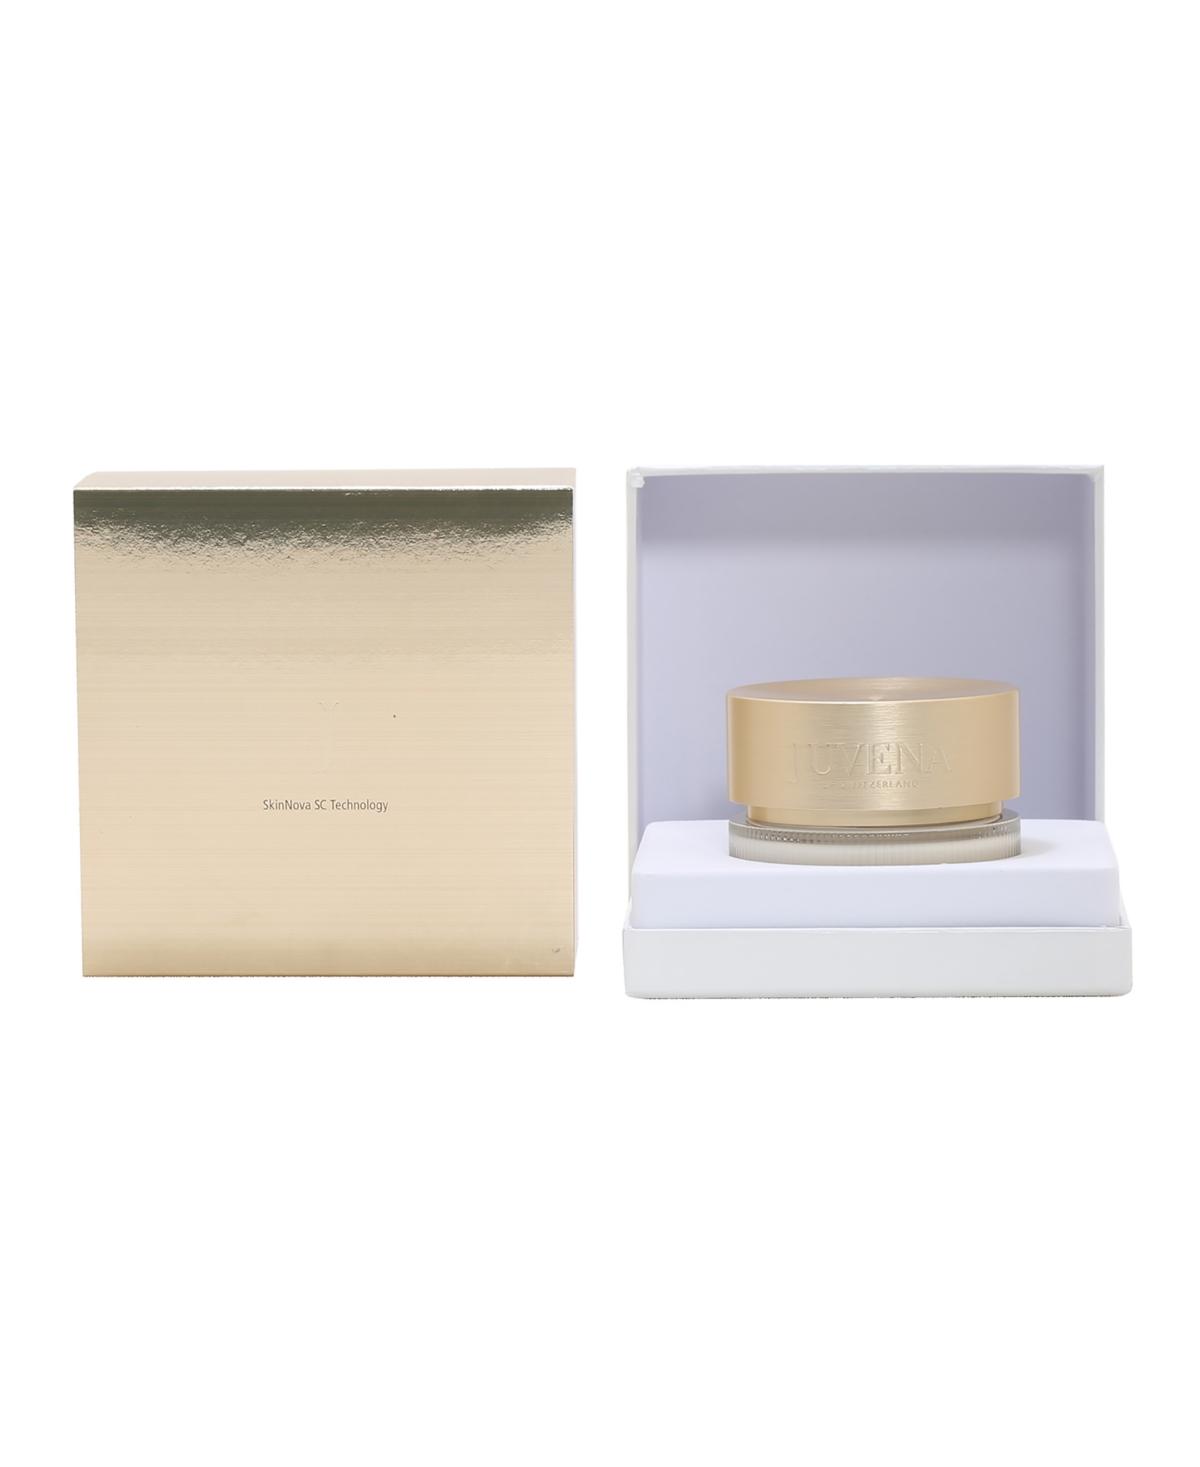 Juvena Master Cream Jar, 2.5 oz